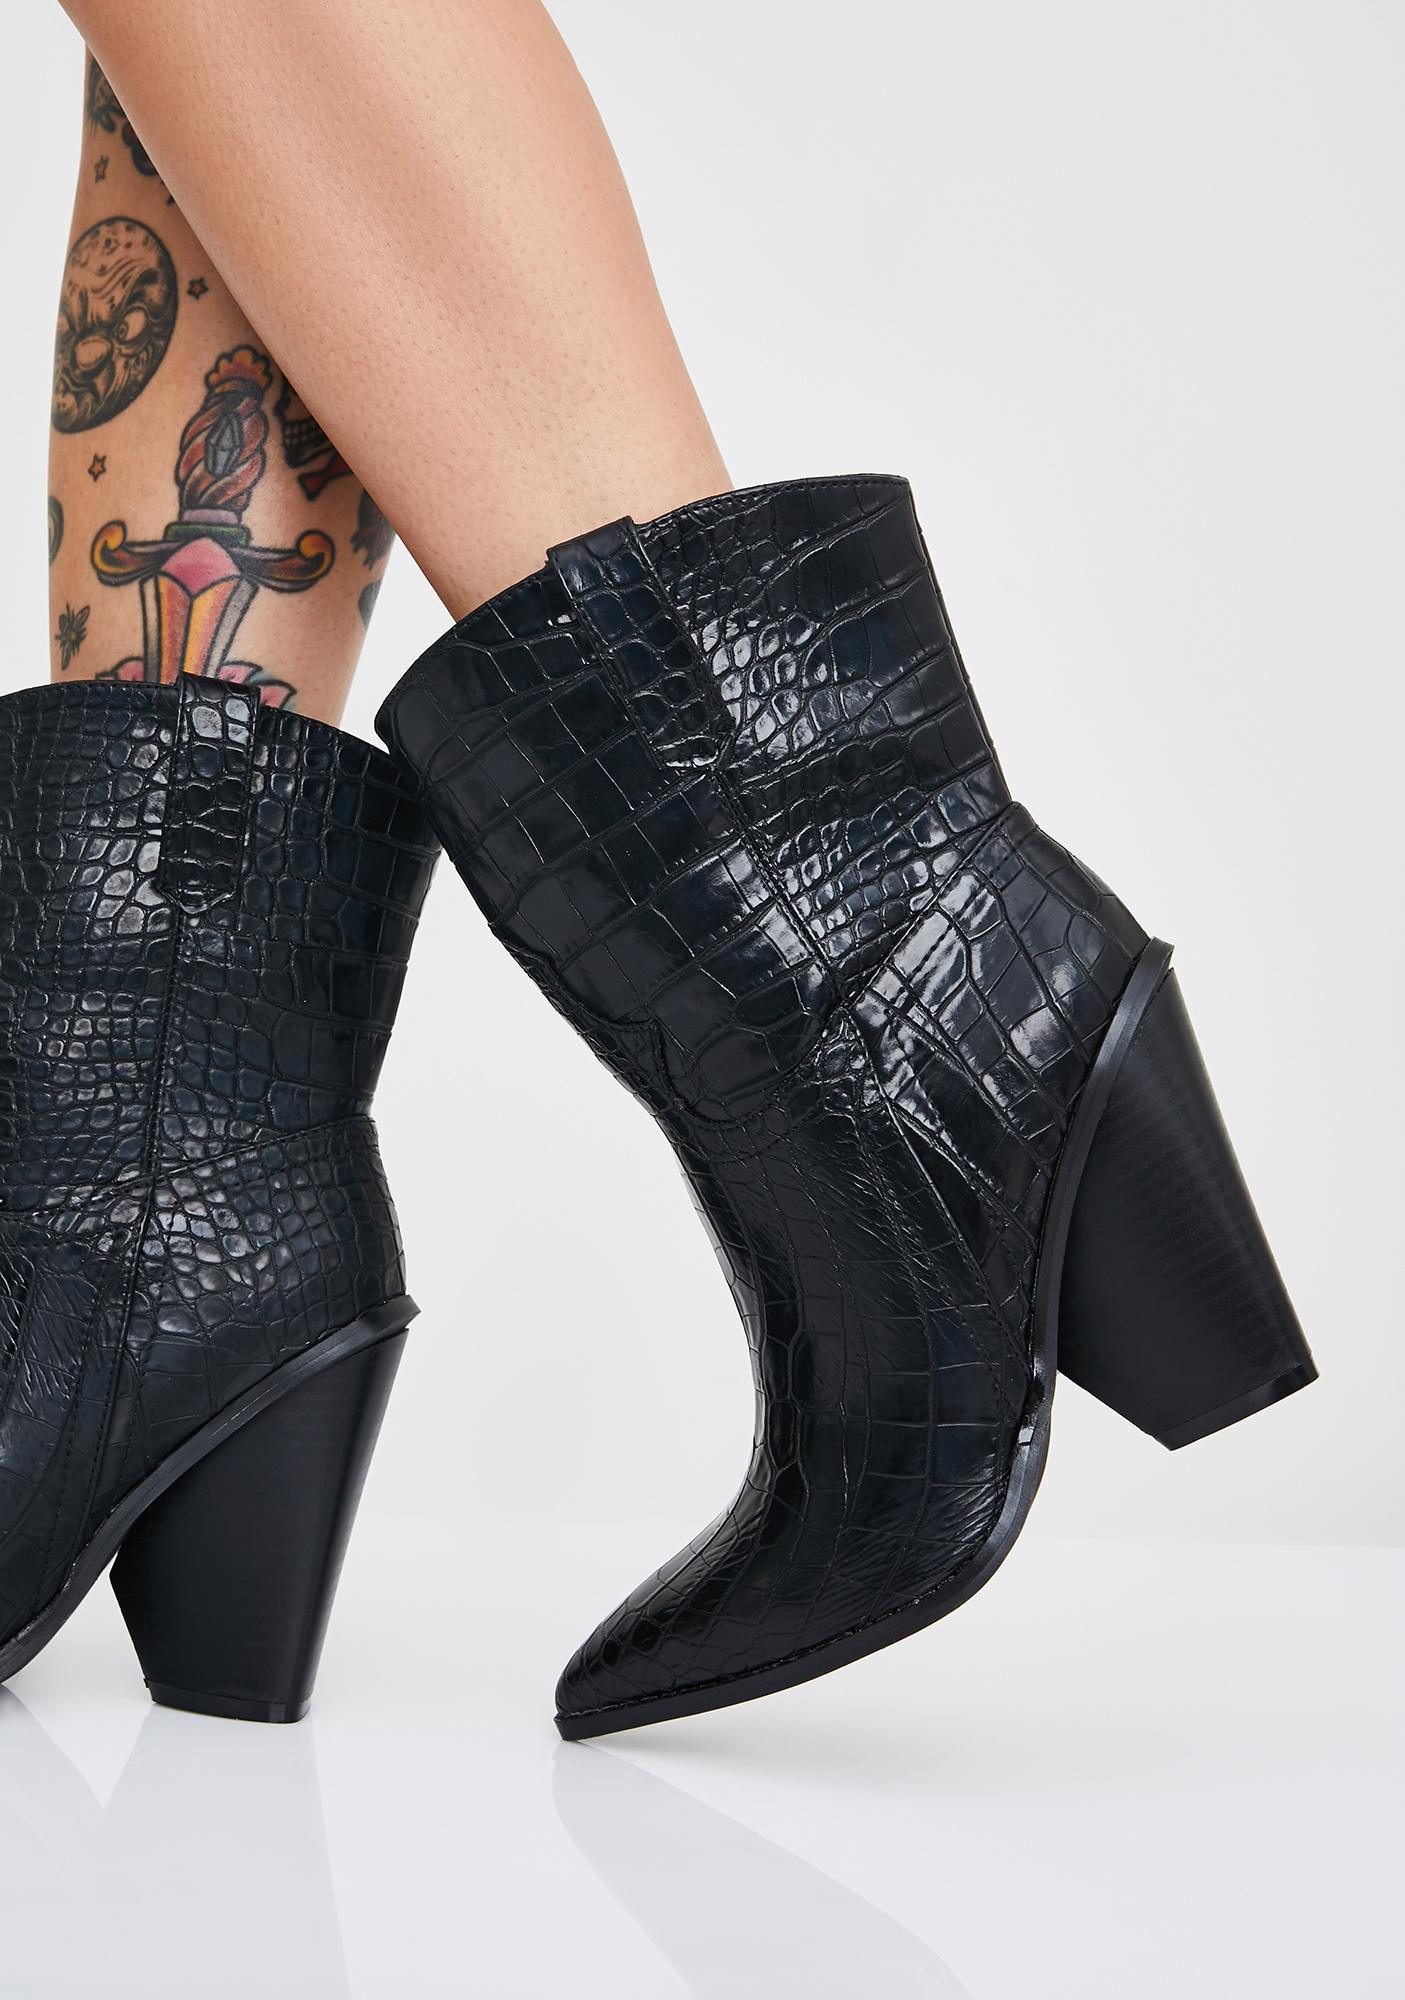 Toxic Cowboy Snakeskin Boots